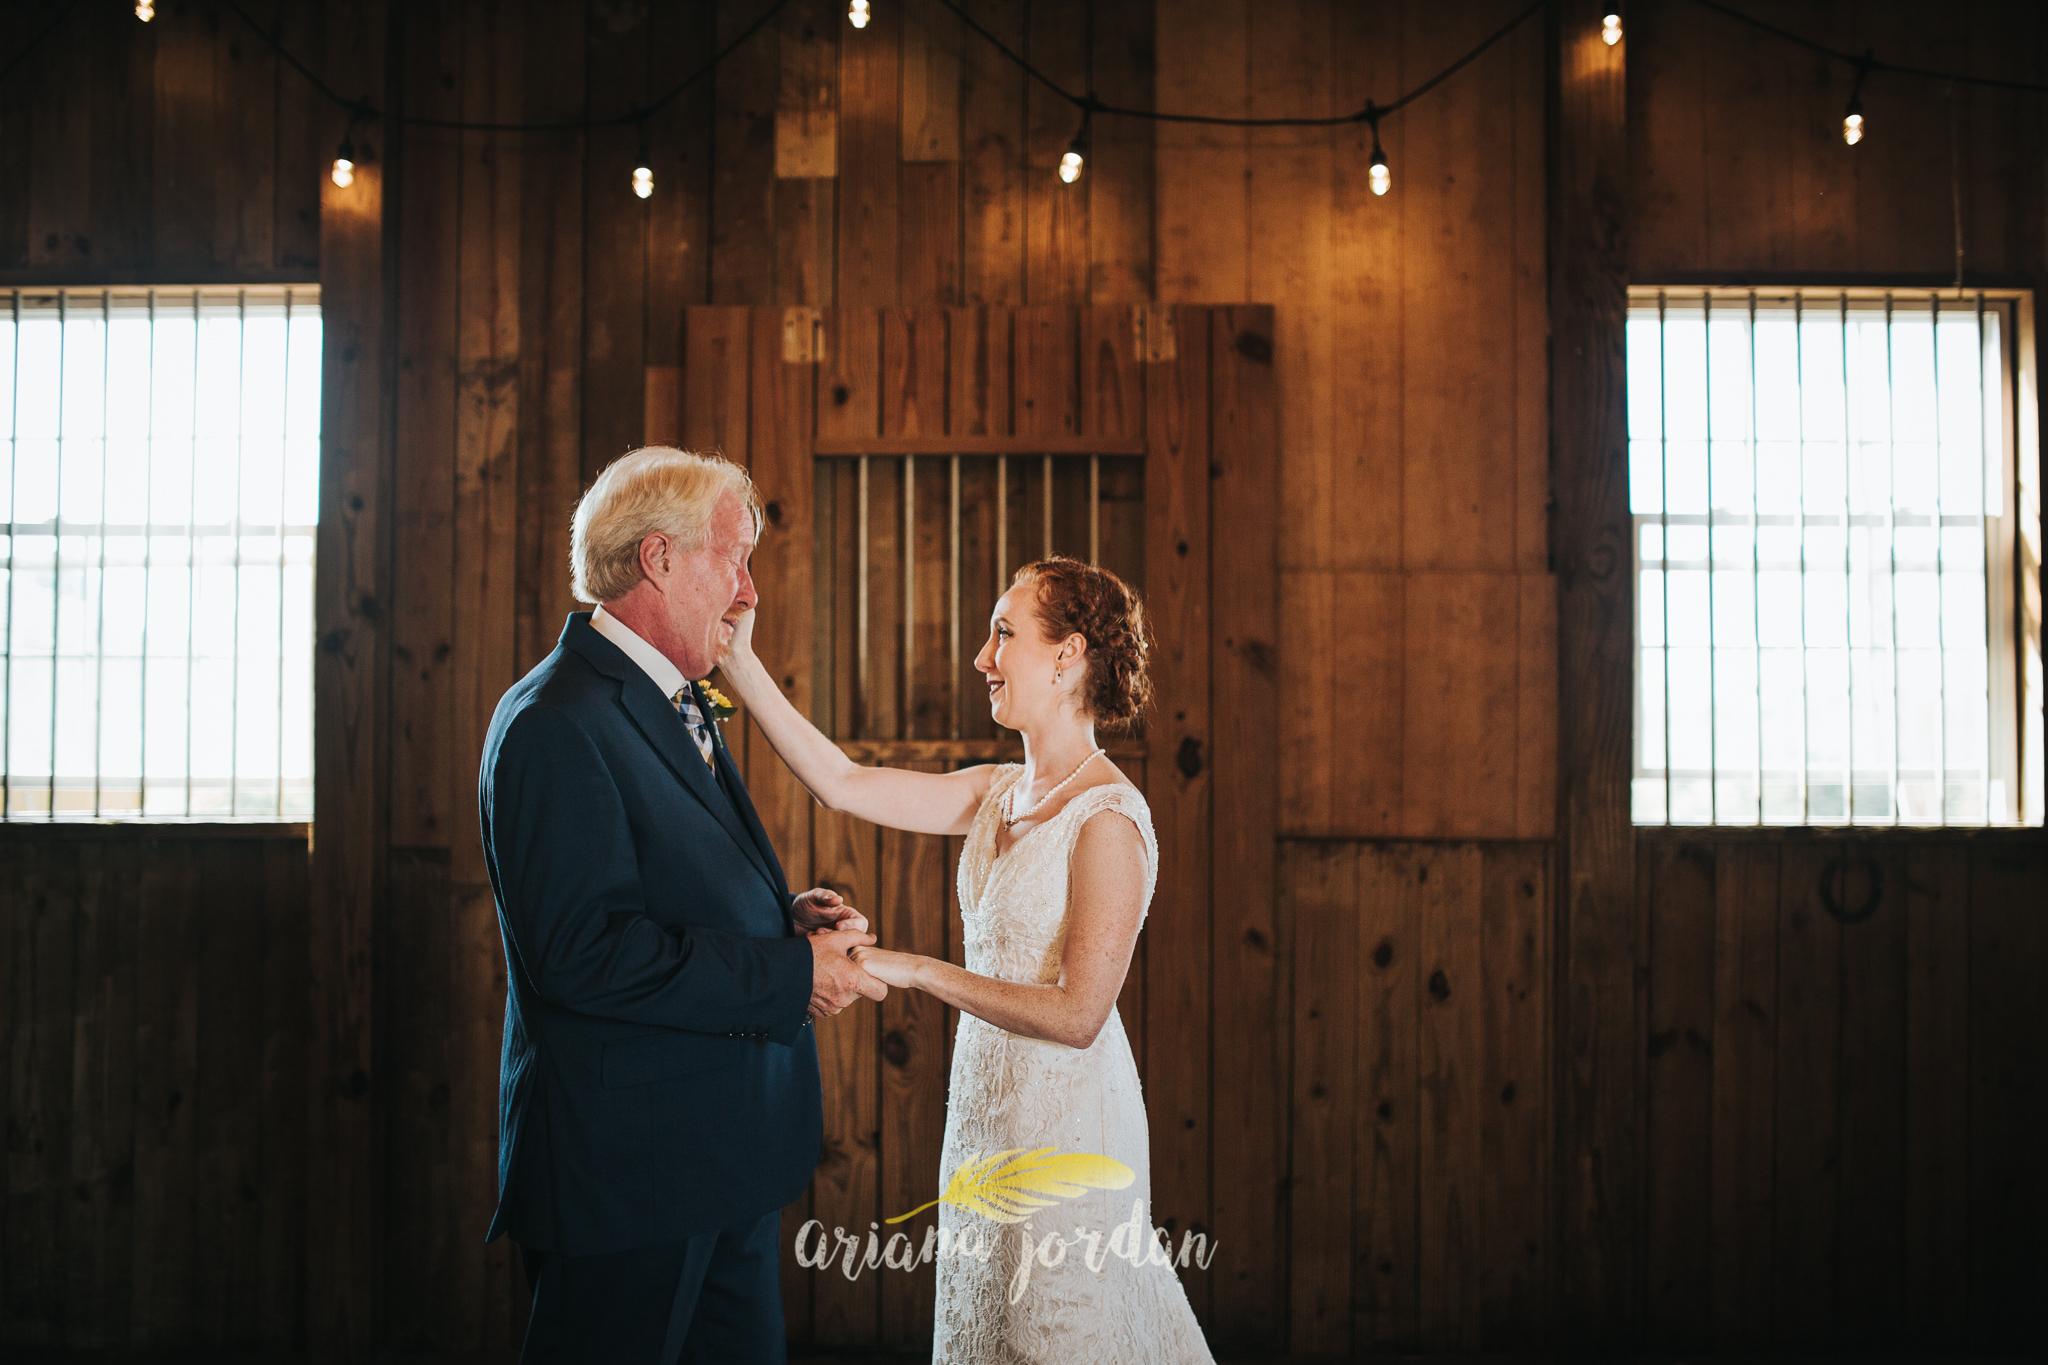 053 Ariana Jordan Photography -Moonlight Fields Lexington Ky Wedding Photographer 1469.jpg